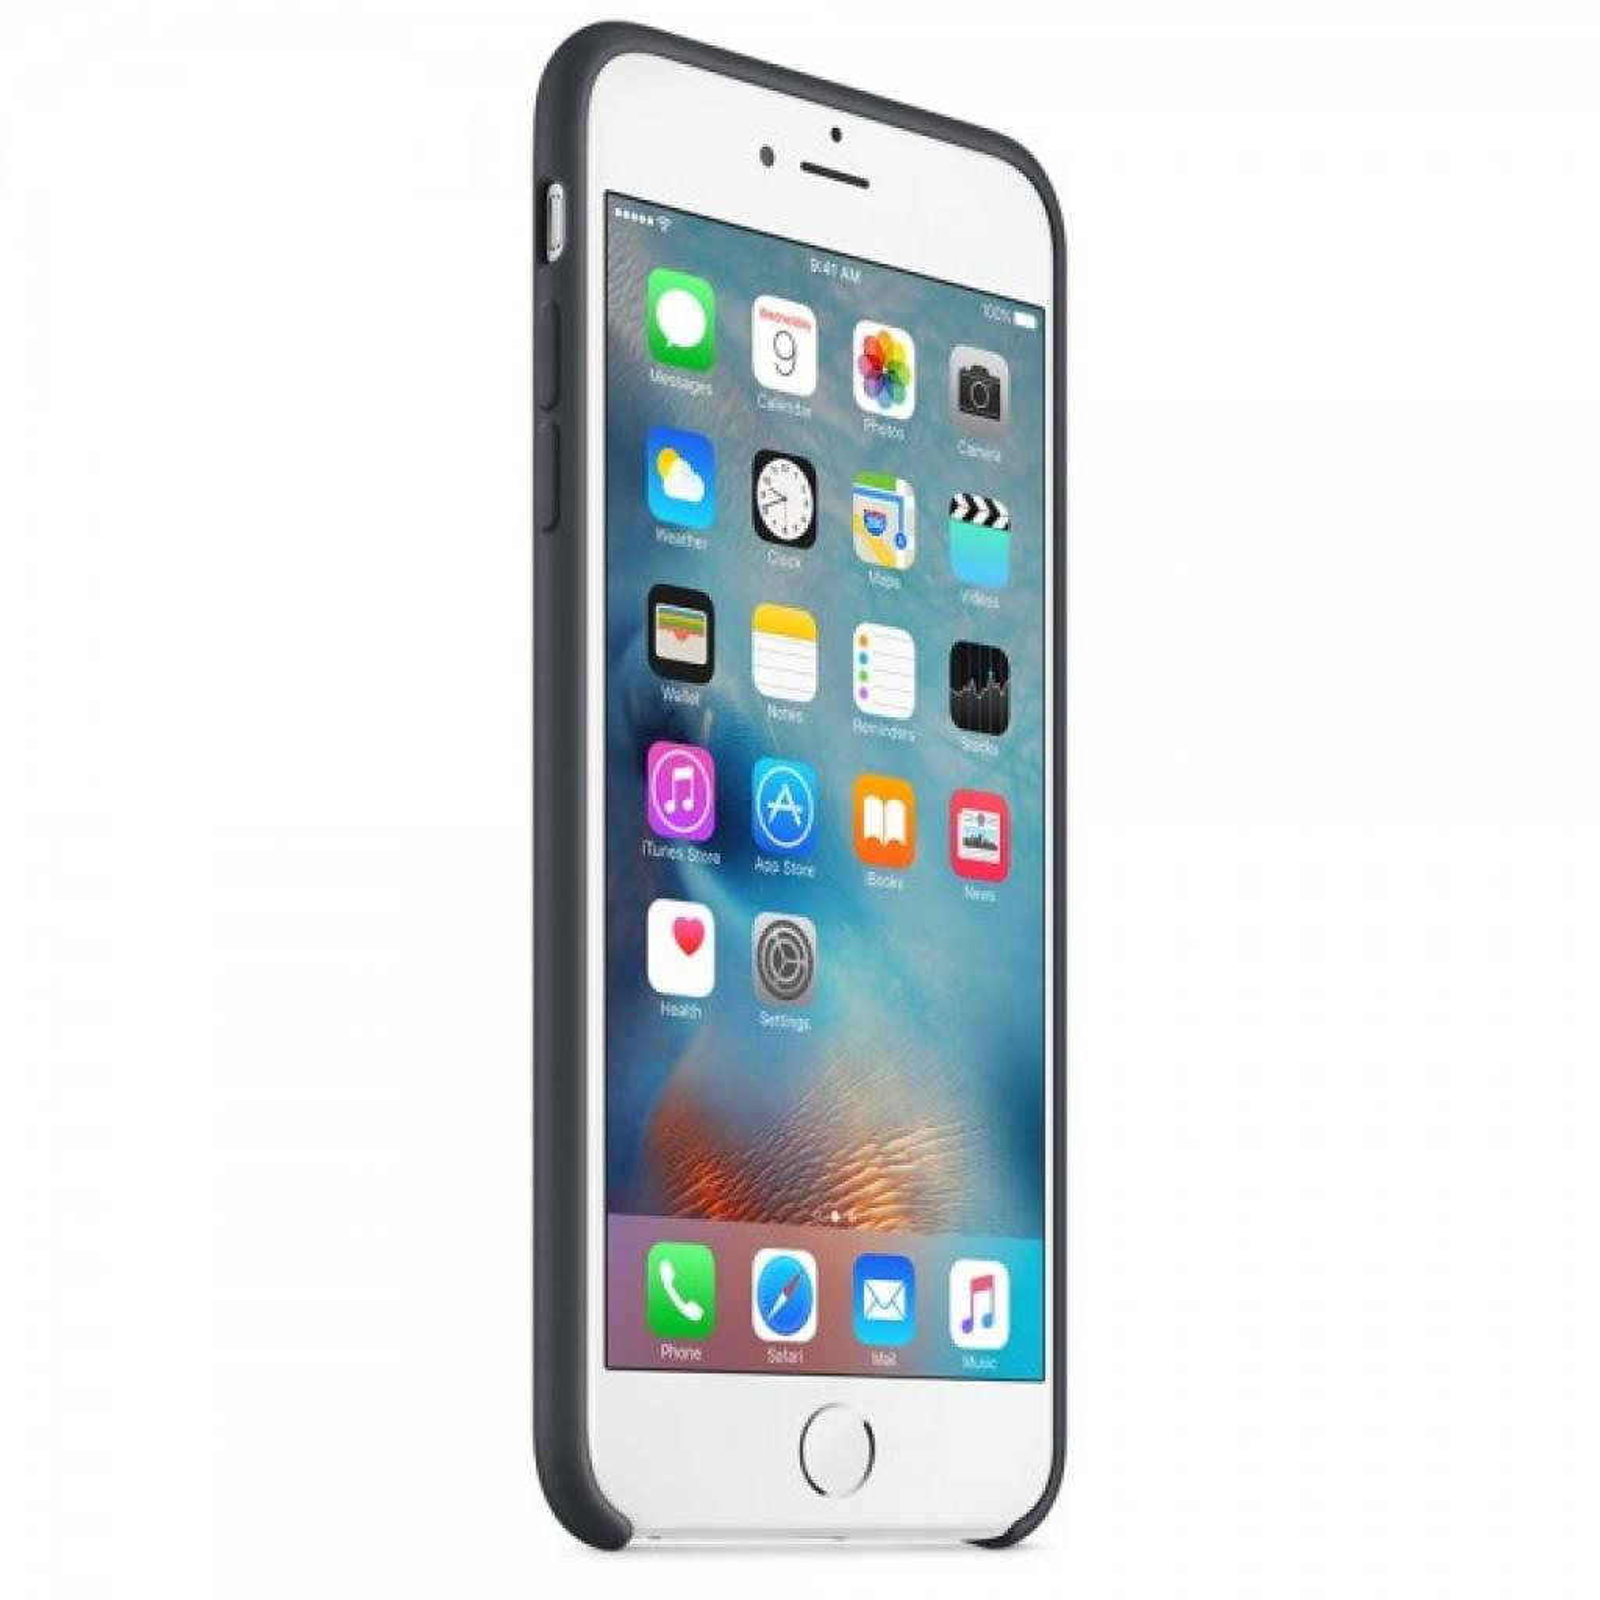 Чехол для моб. телефона Apple для iPhone 6 Plus/6s Plus Charcoal Gray (MKXJ2ZM/A) изображение 4